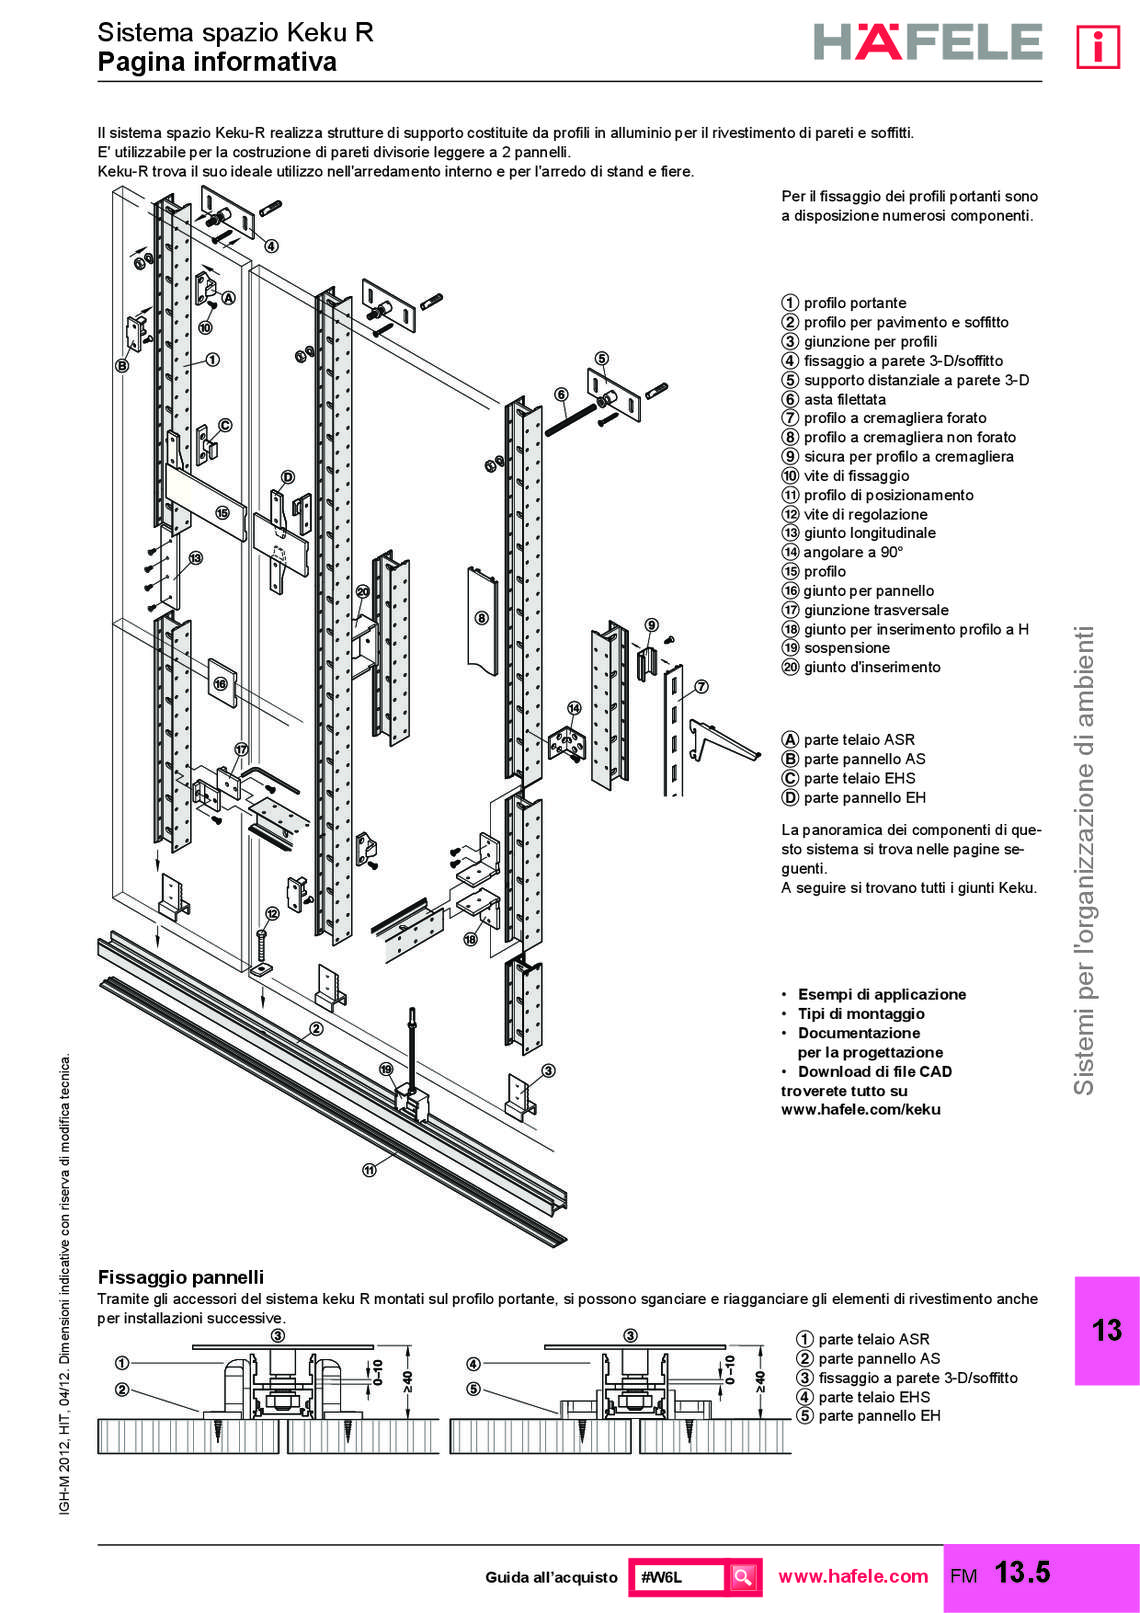 hafele-arredo-negozi-e-farmacie_32_014.jpg